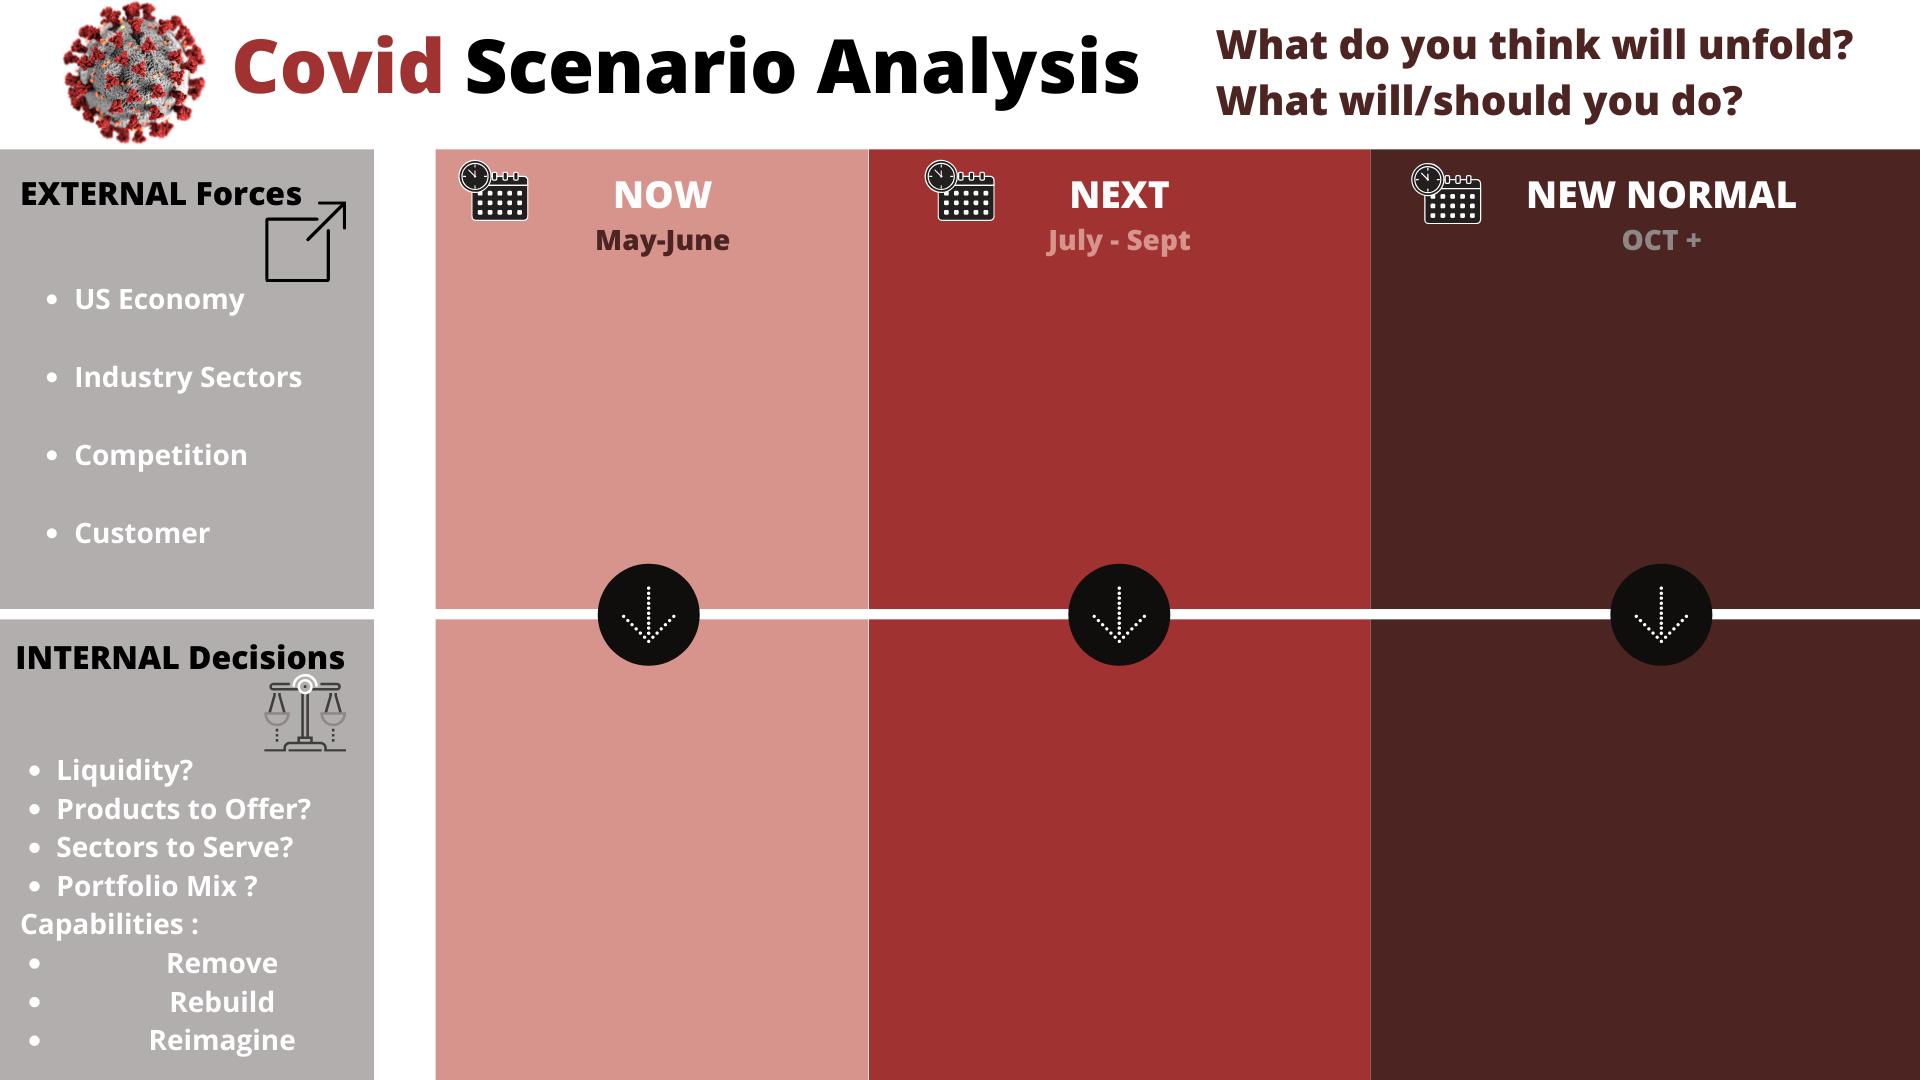 Covid Scenario Analysis